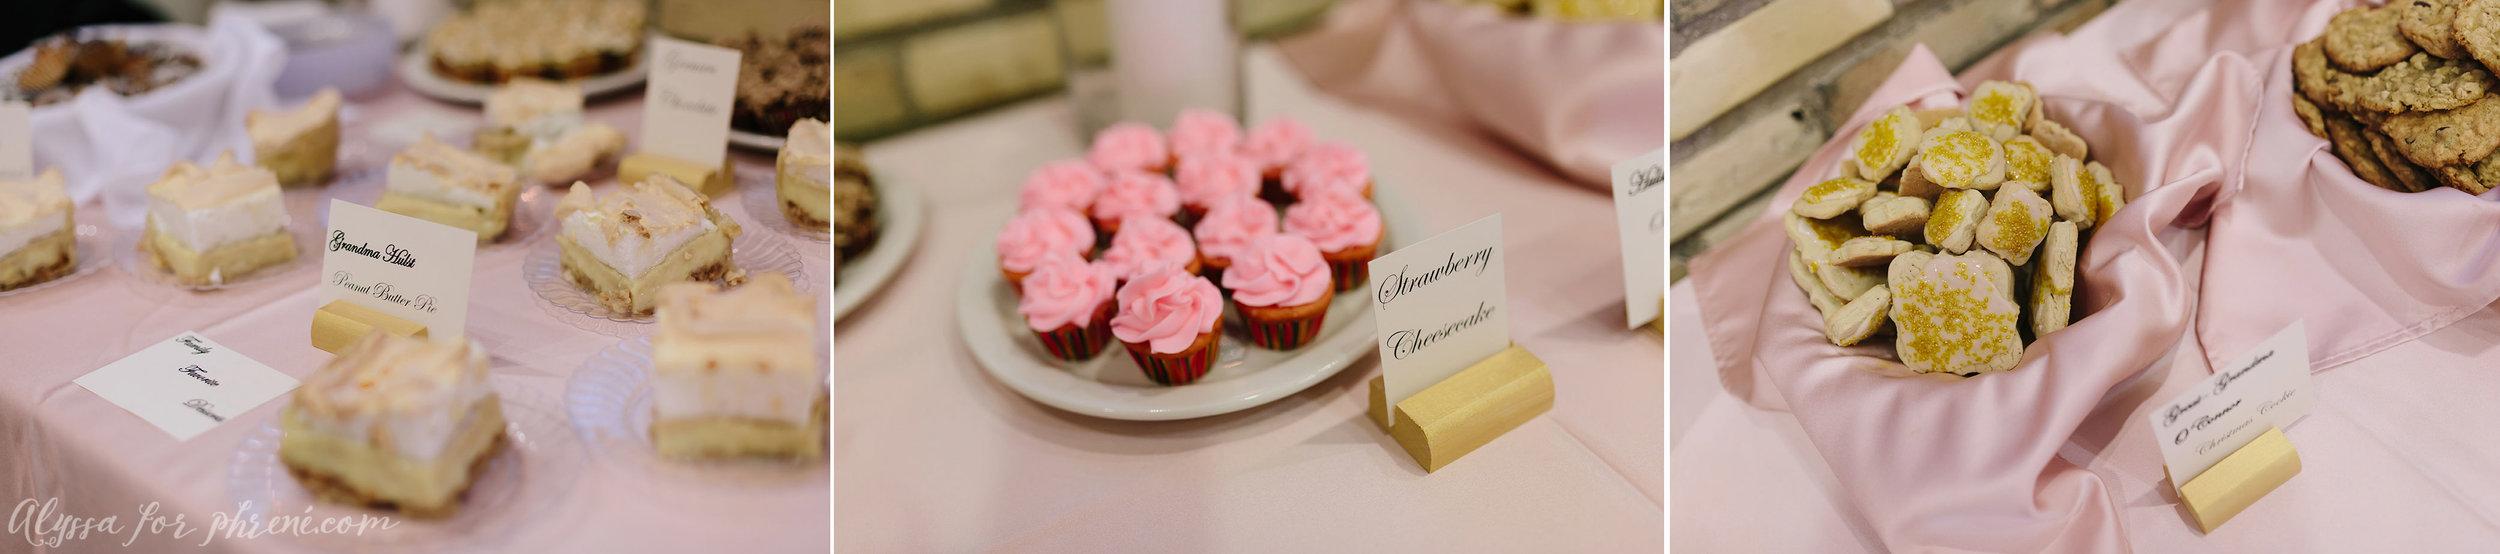 Century_Club_Ballroom_Wedding_088.jpg